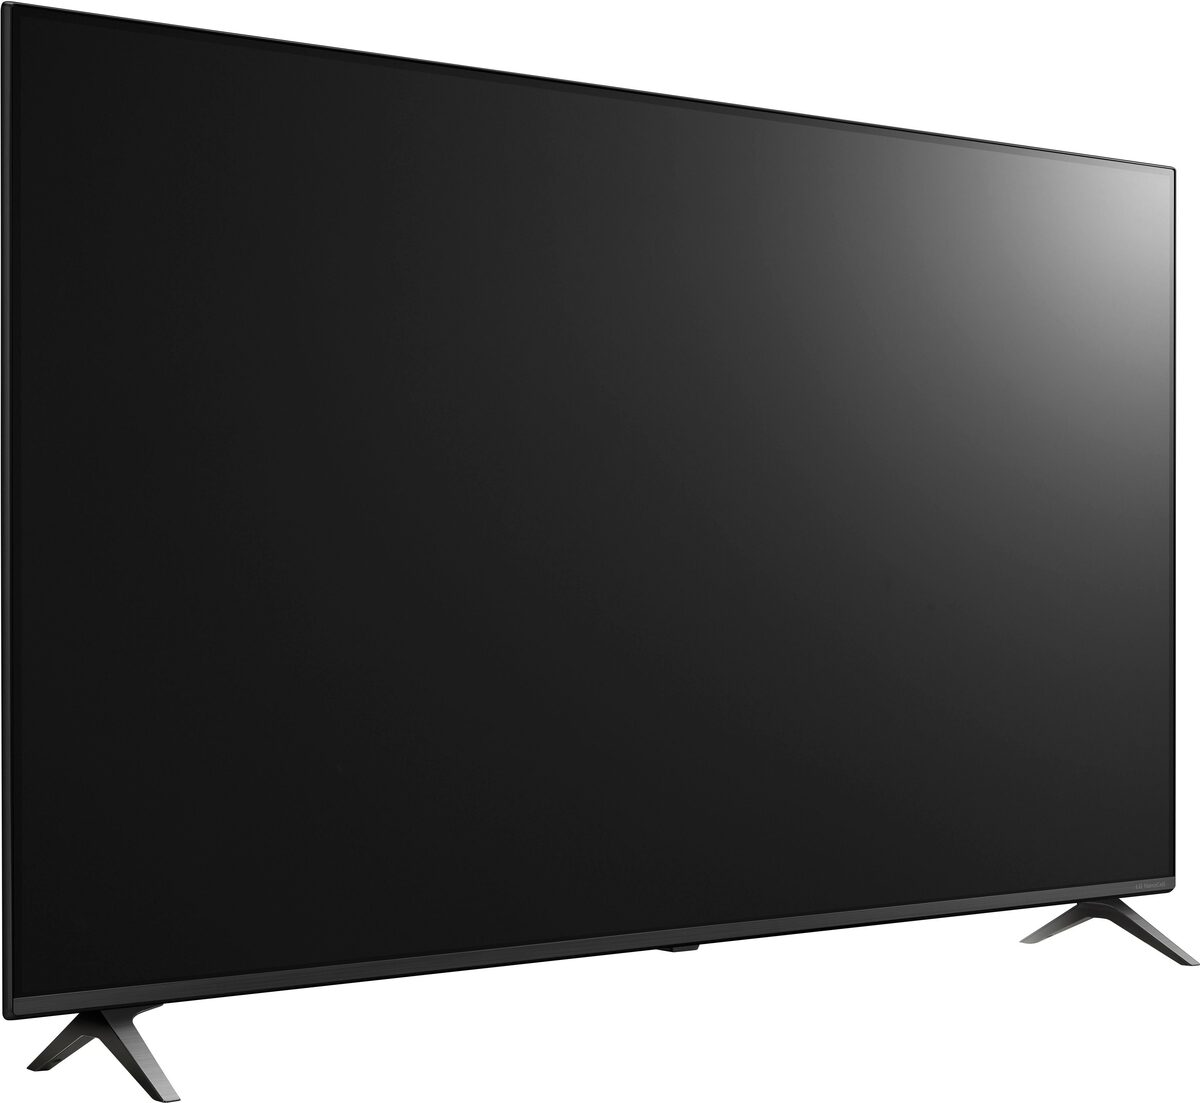 Bild 3 von LG 55SM8050PLC LED-Fernseher (139 cm/55 Zoll, 4K Ultra HD, Smart-TV, NanoCell)